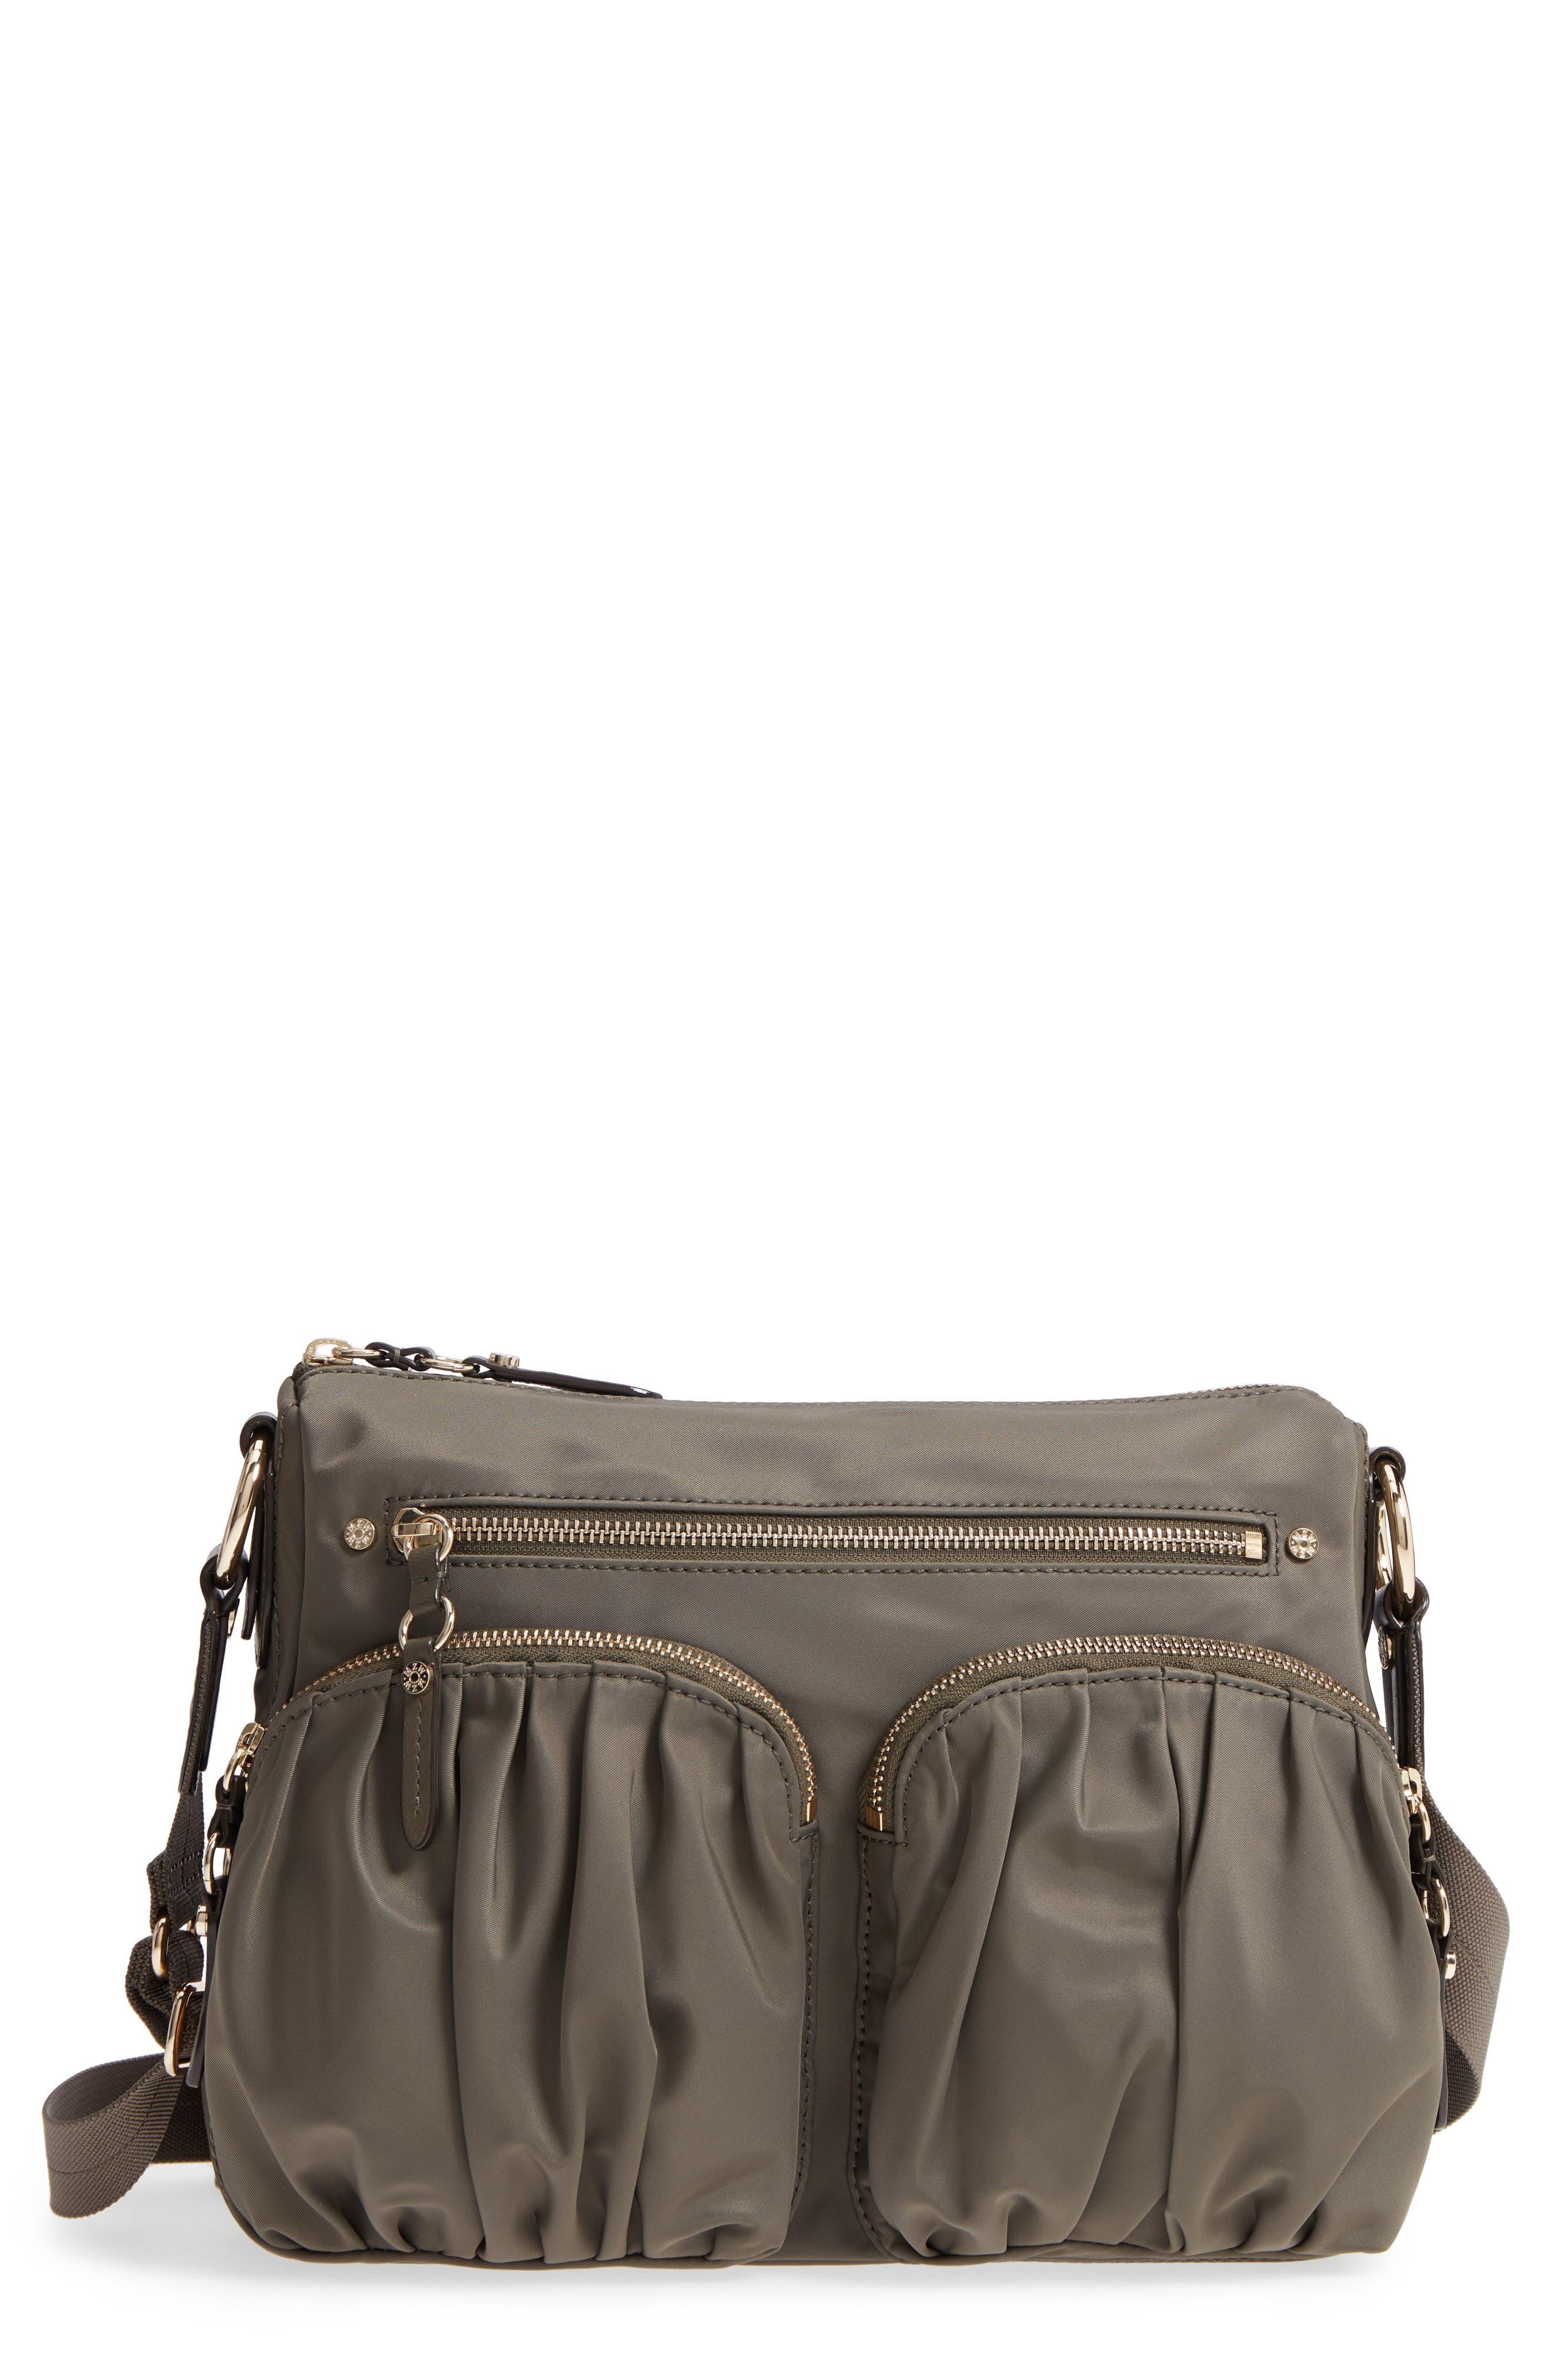 Paige Crossbody Bag,                         Main,                         color, Clay